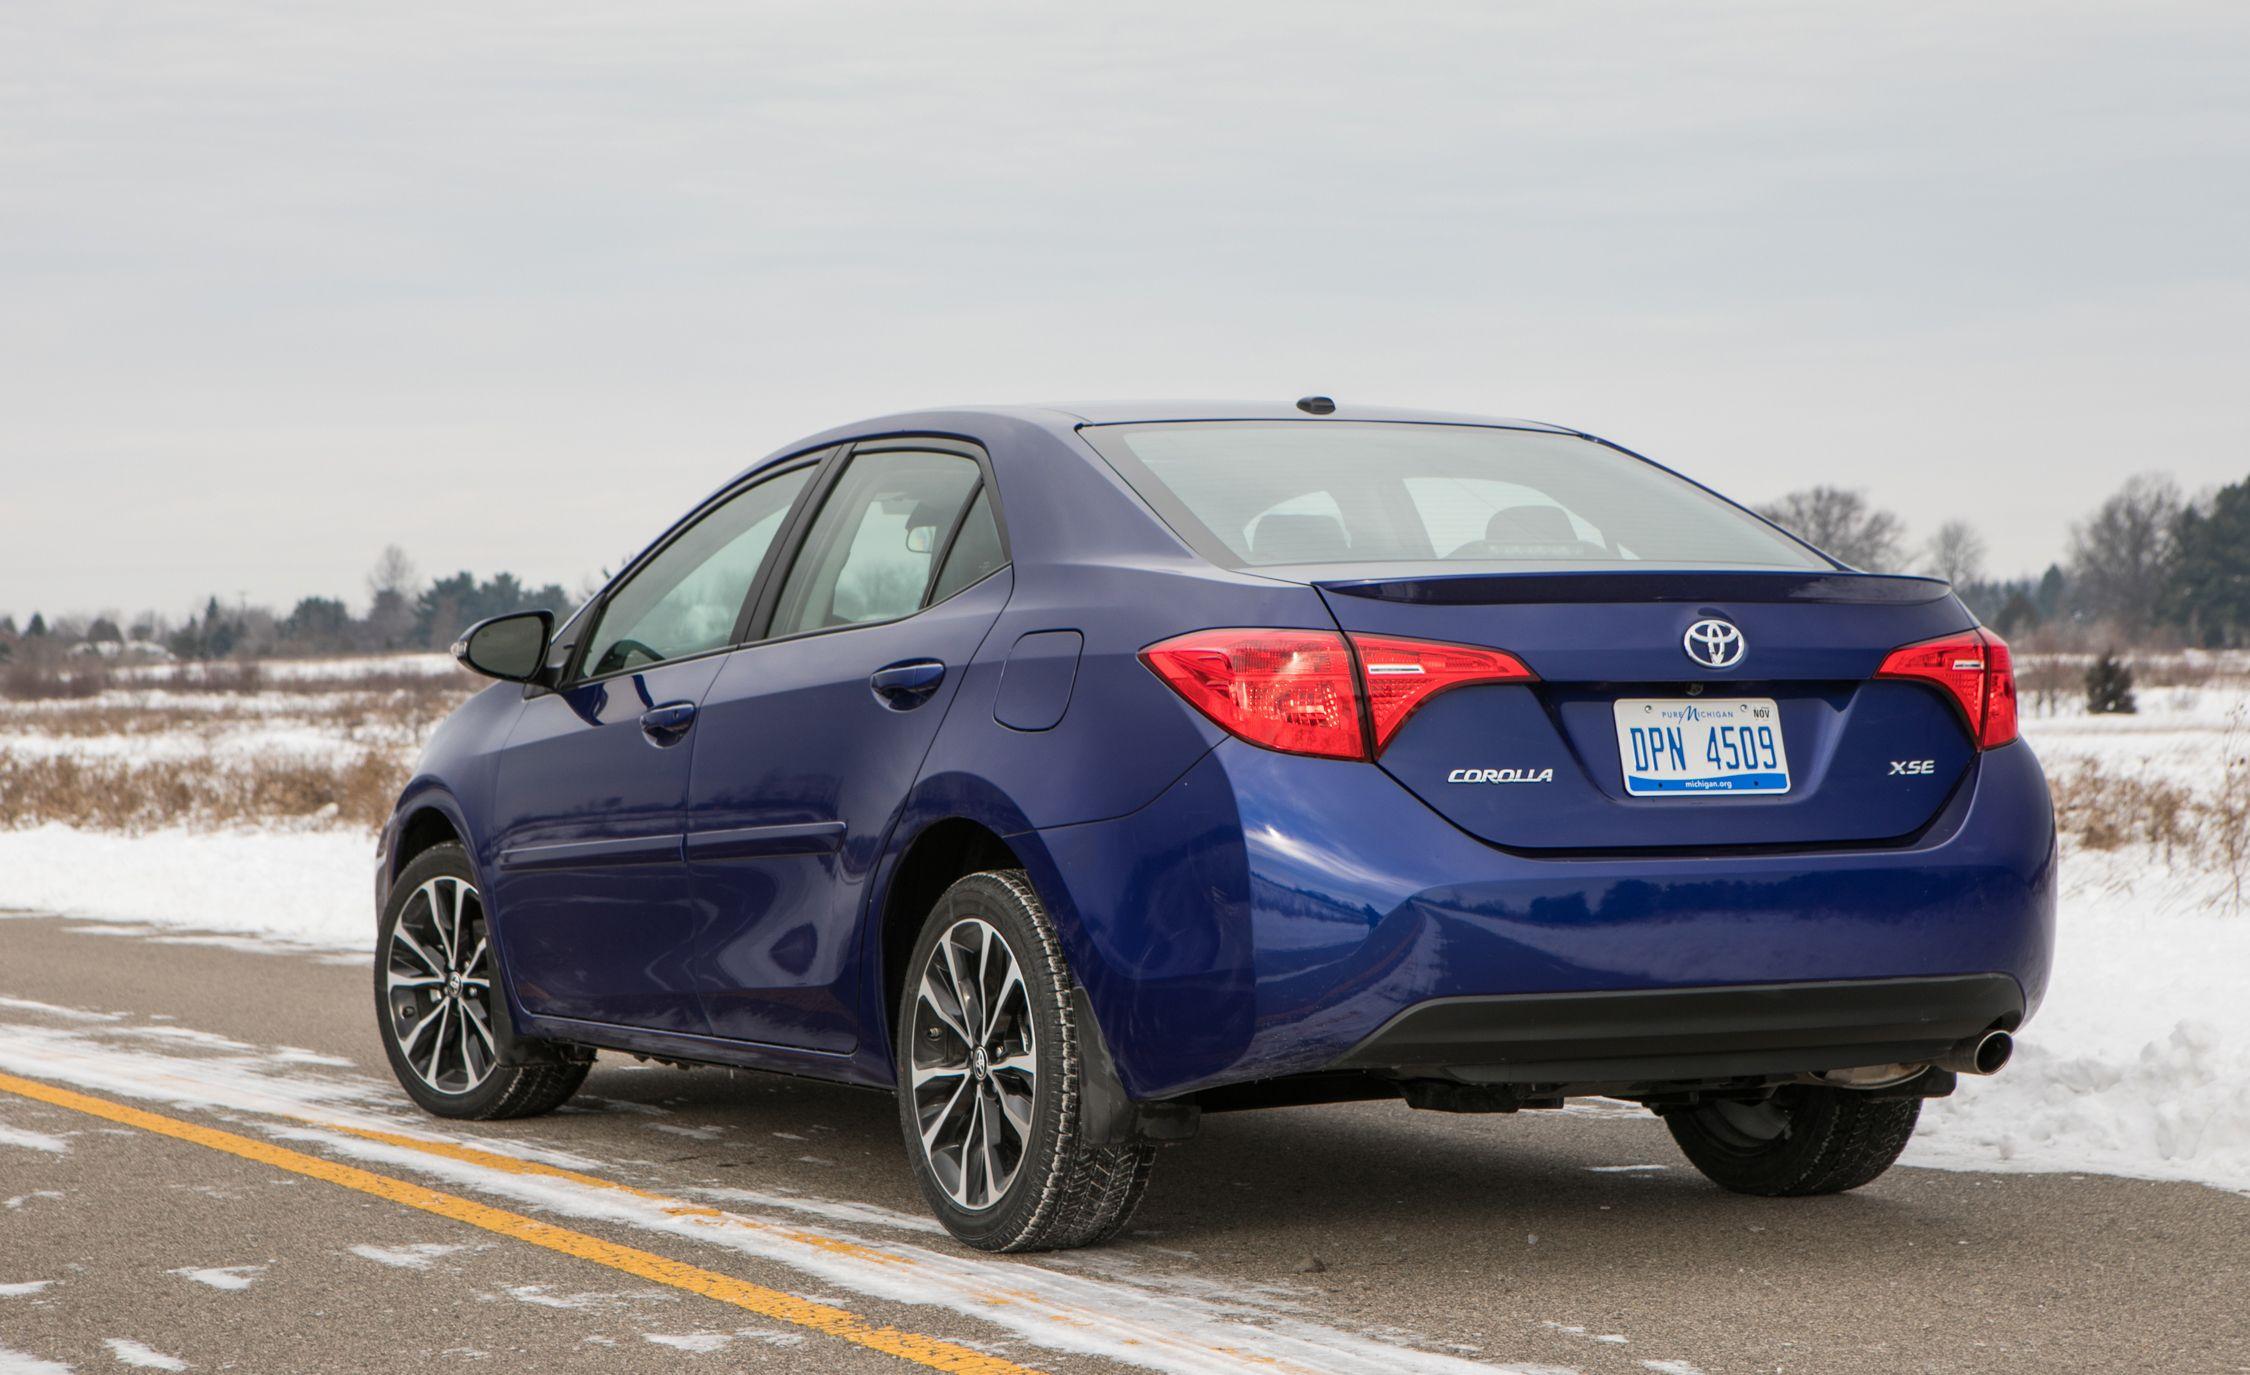 Toyota Corolla Gas Mileage >> 2017 Toyota Corolla Fuel Economy Review Car And Driver